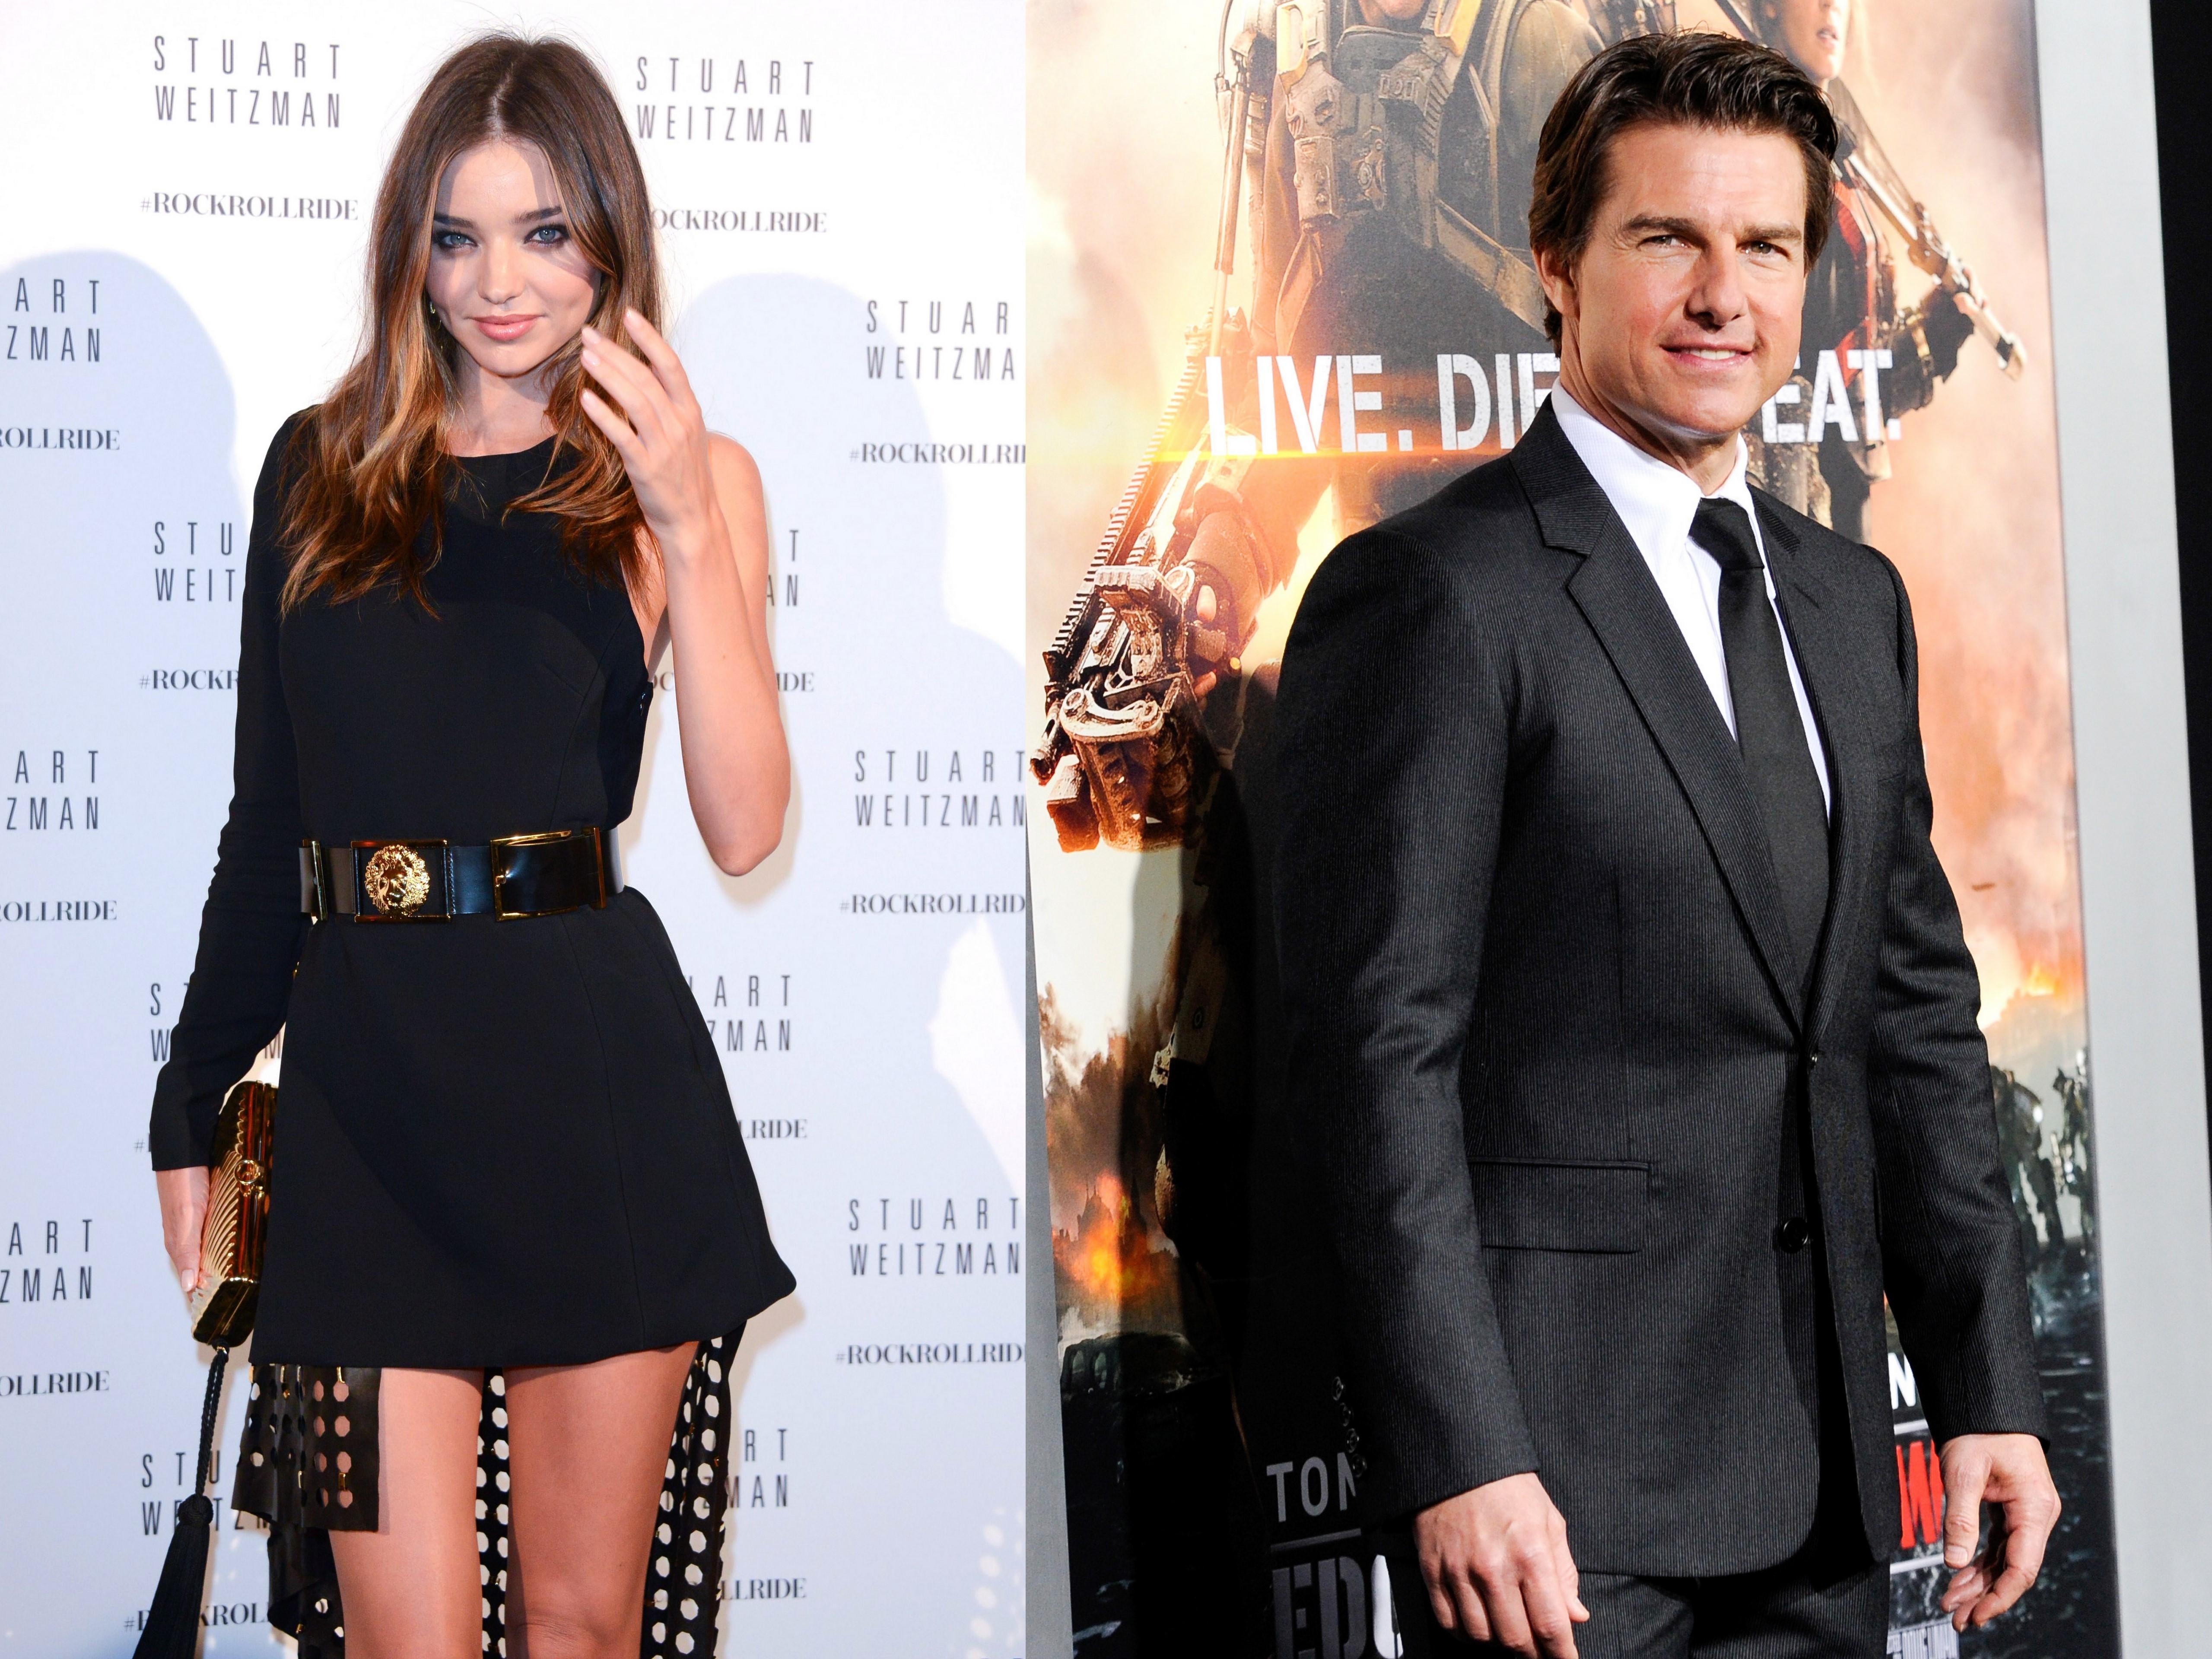 Are Miranda Kerr and Tom Cruise secretly dating?